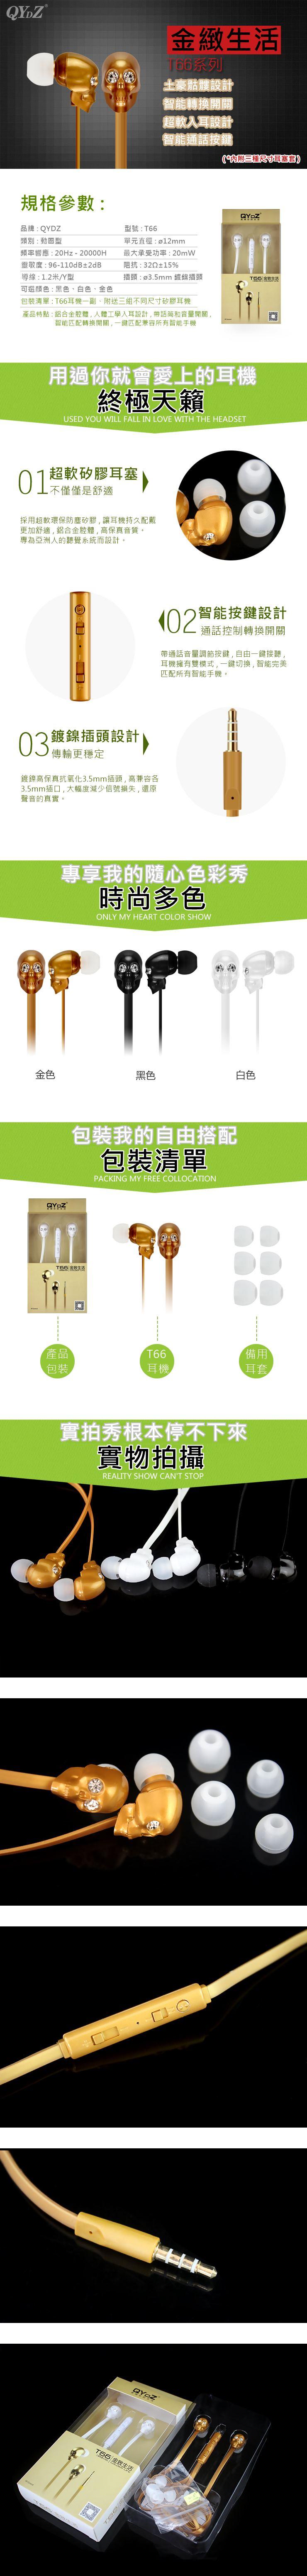 C0115 QYDZ T66耳機通用系列長圖(沒mina)